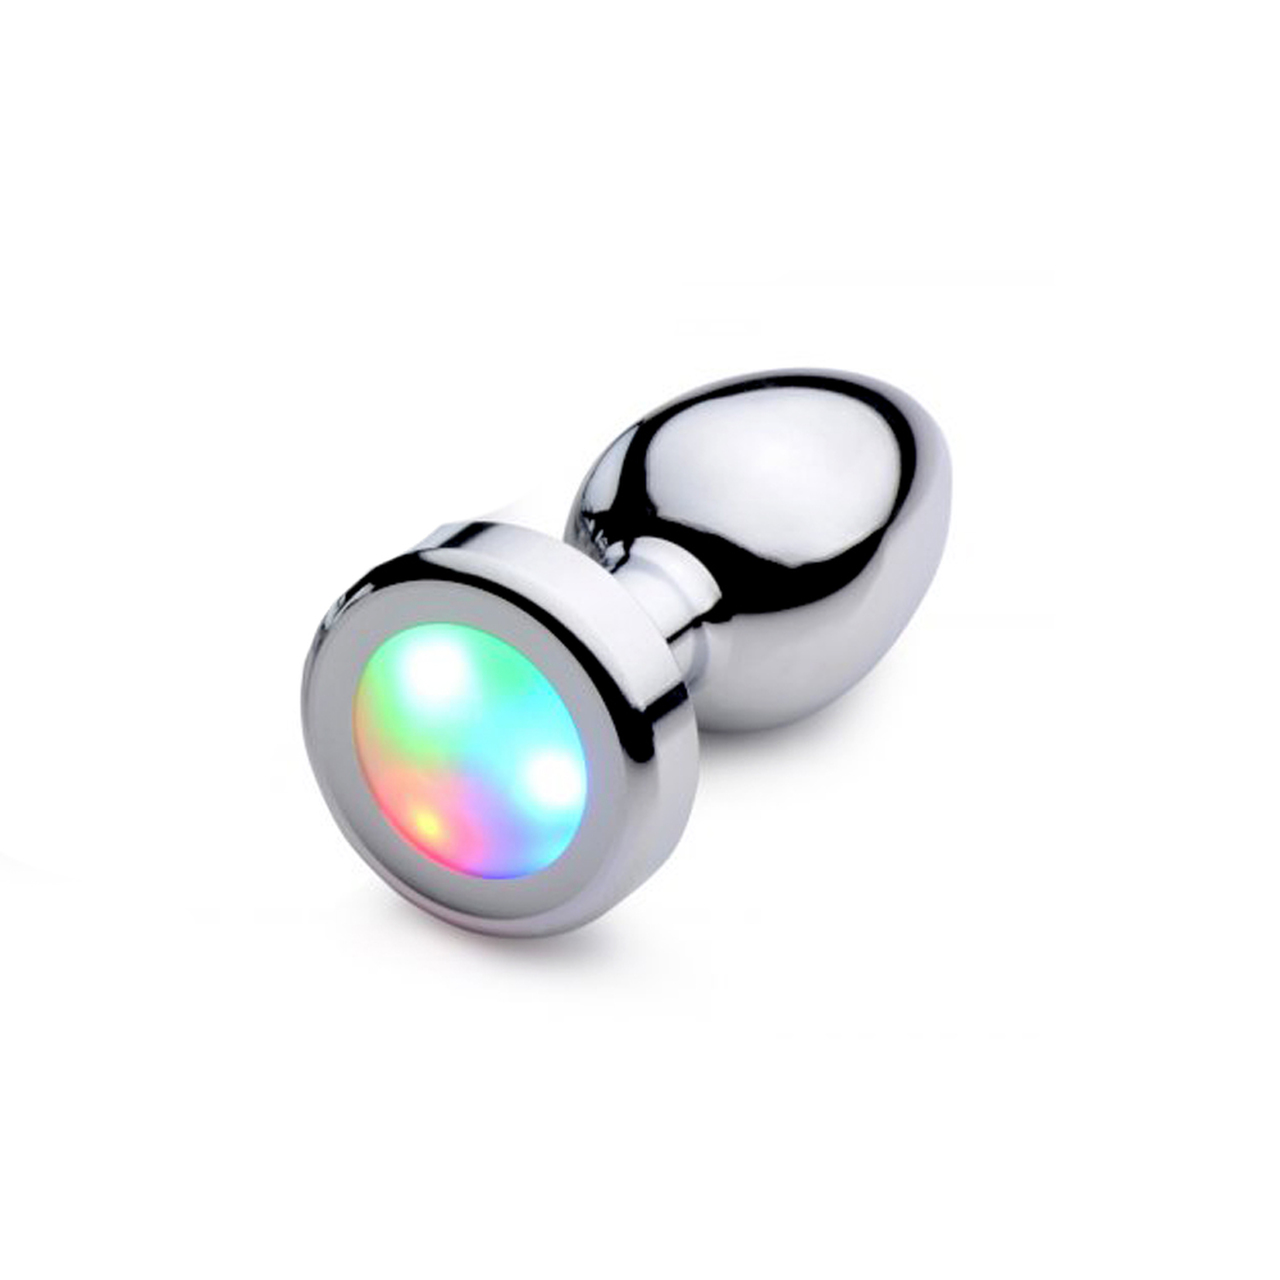 Analplug xr brands booty sparks light up rainbow led polished aluminum anal plug  small